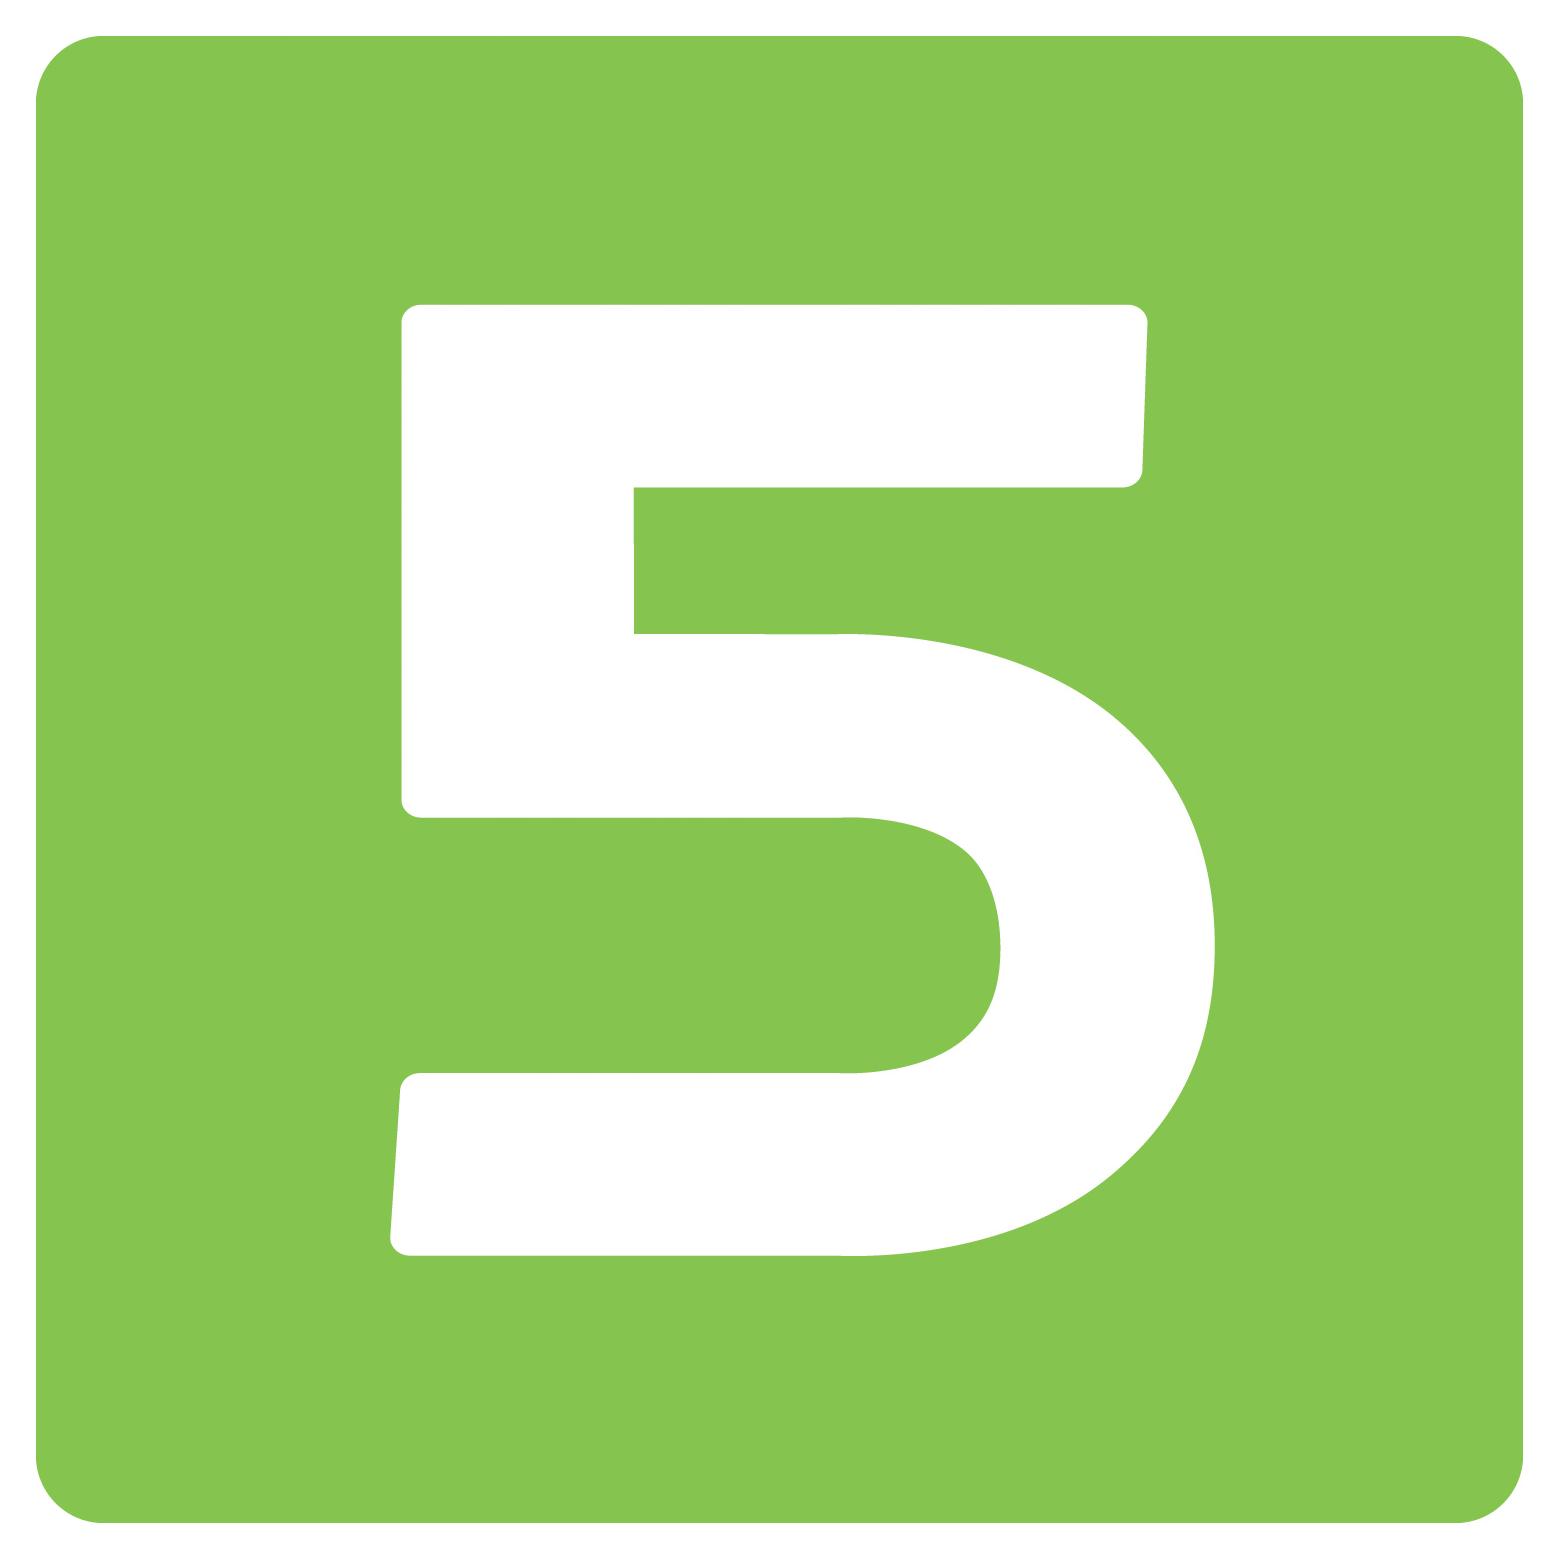 filenet 5 logo 2015png wikimedia commons